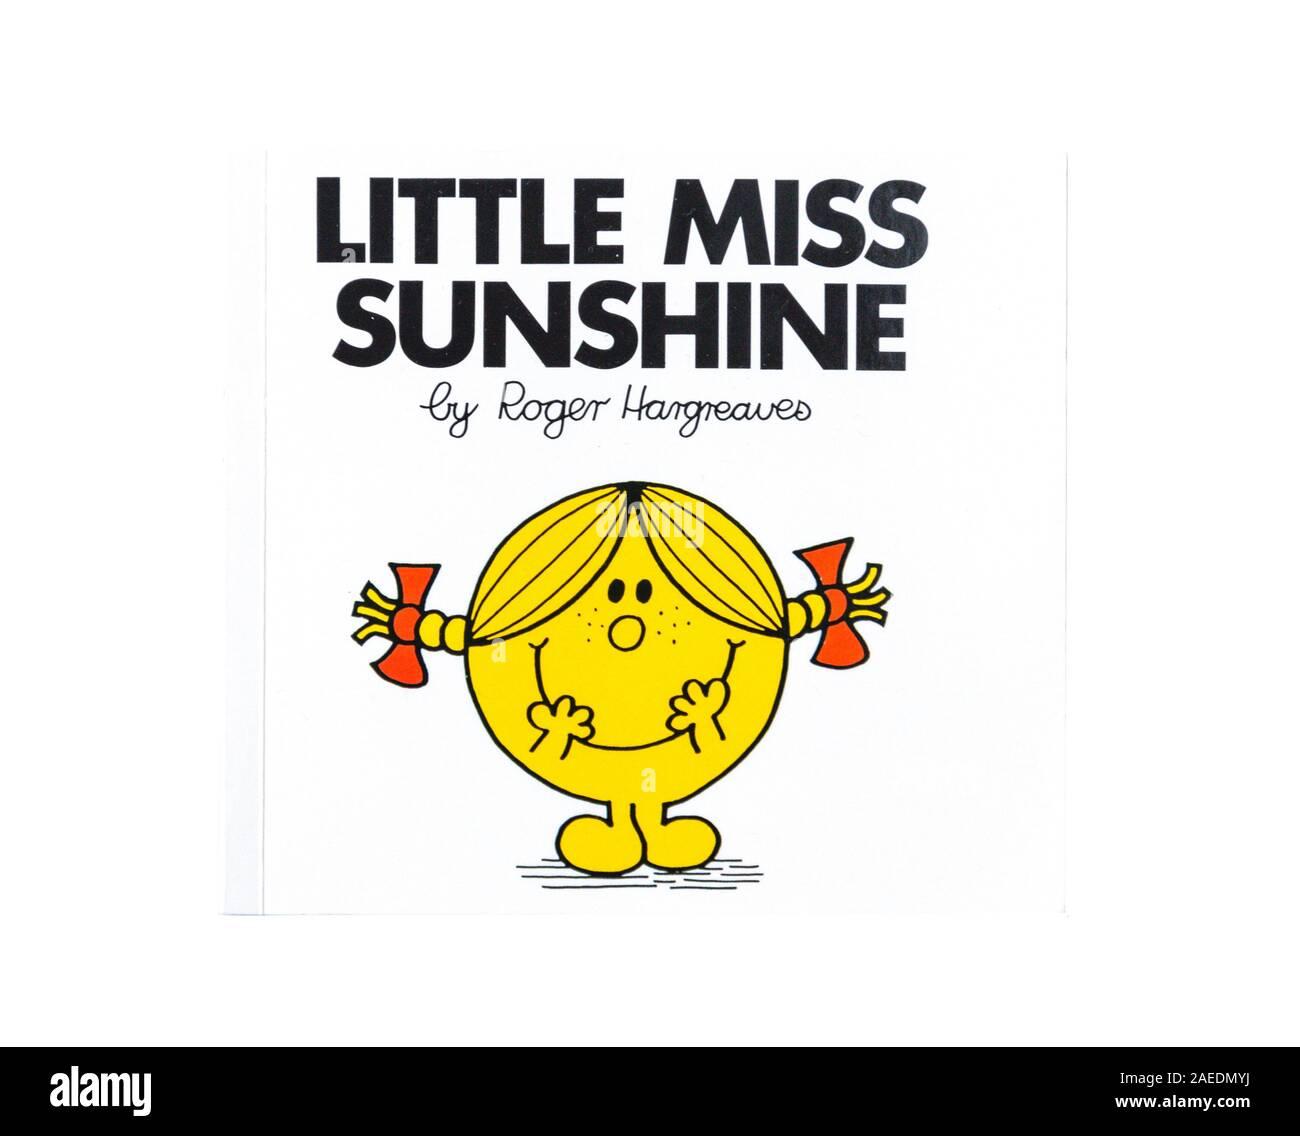 'Little Miss Sunshine' of Mr Men series children's book by Roger Hargreaves, Greater London, England, United Kingdom Stock Photo